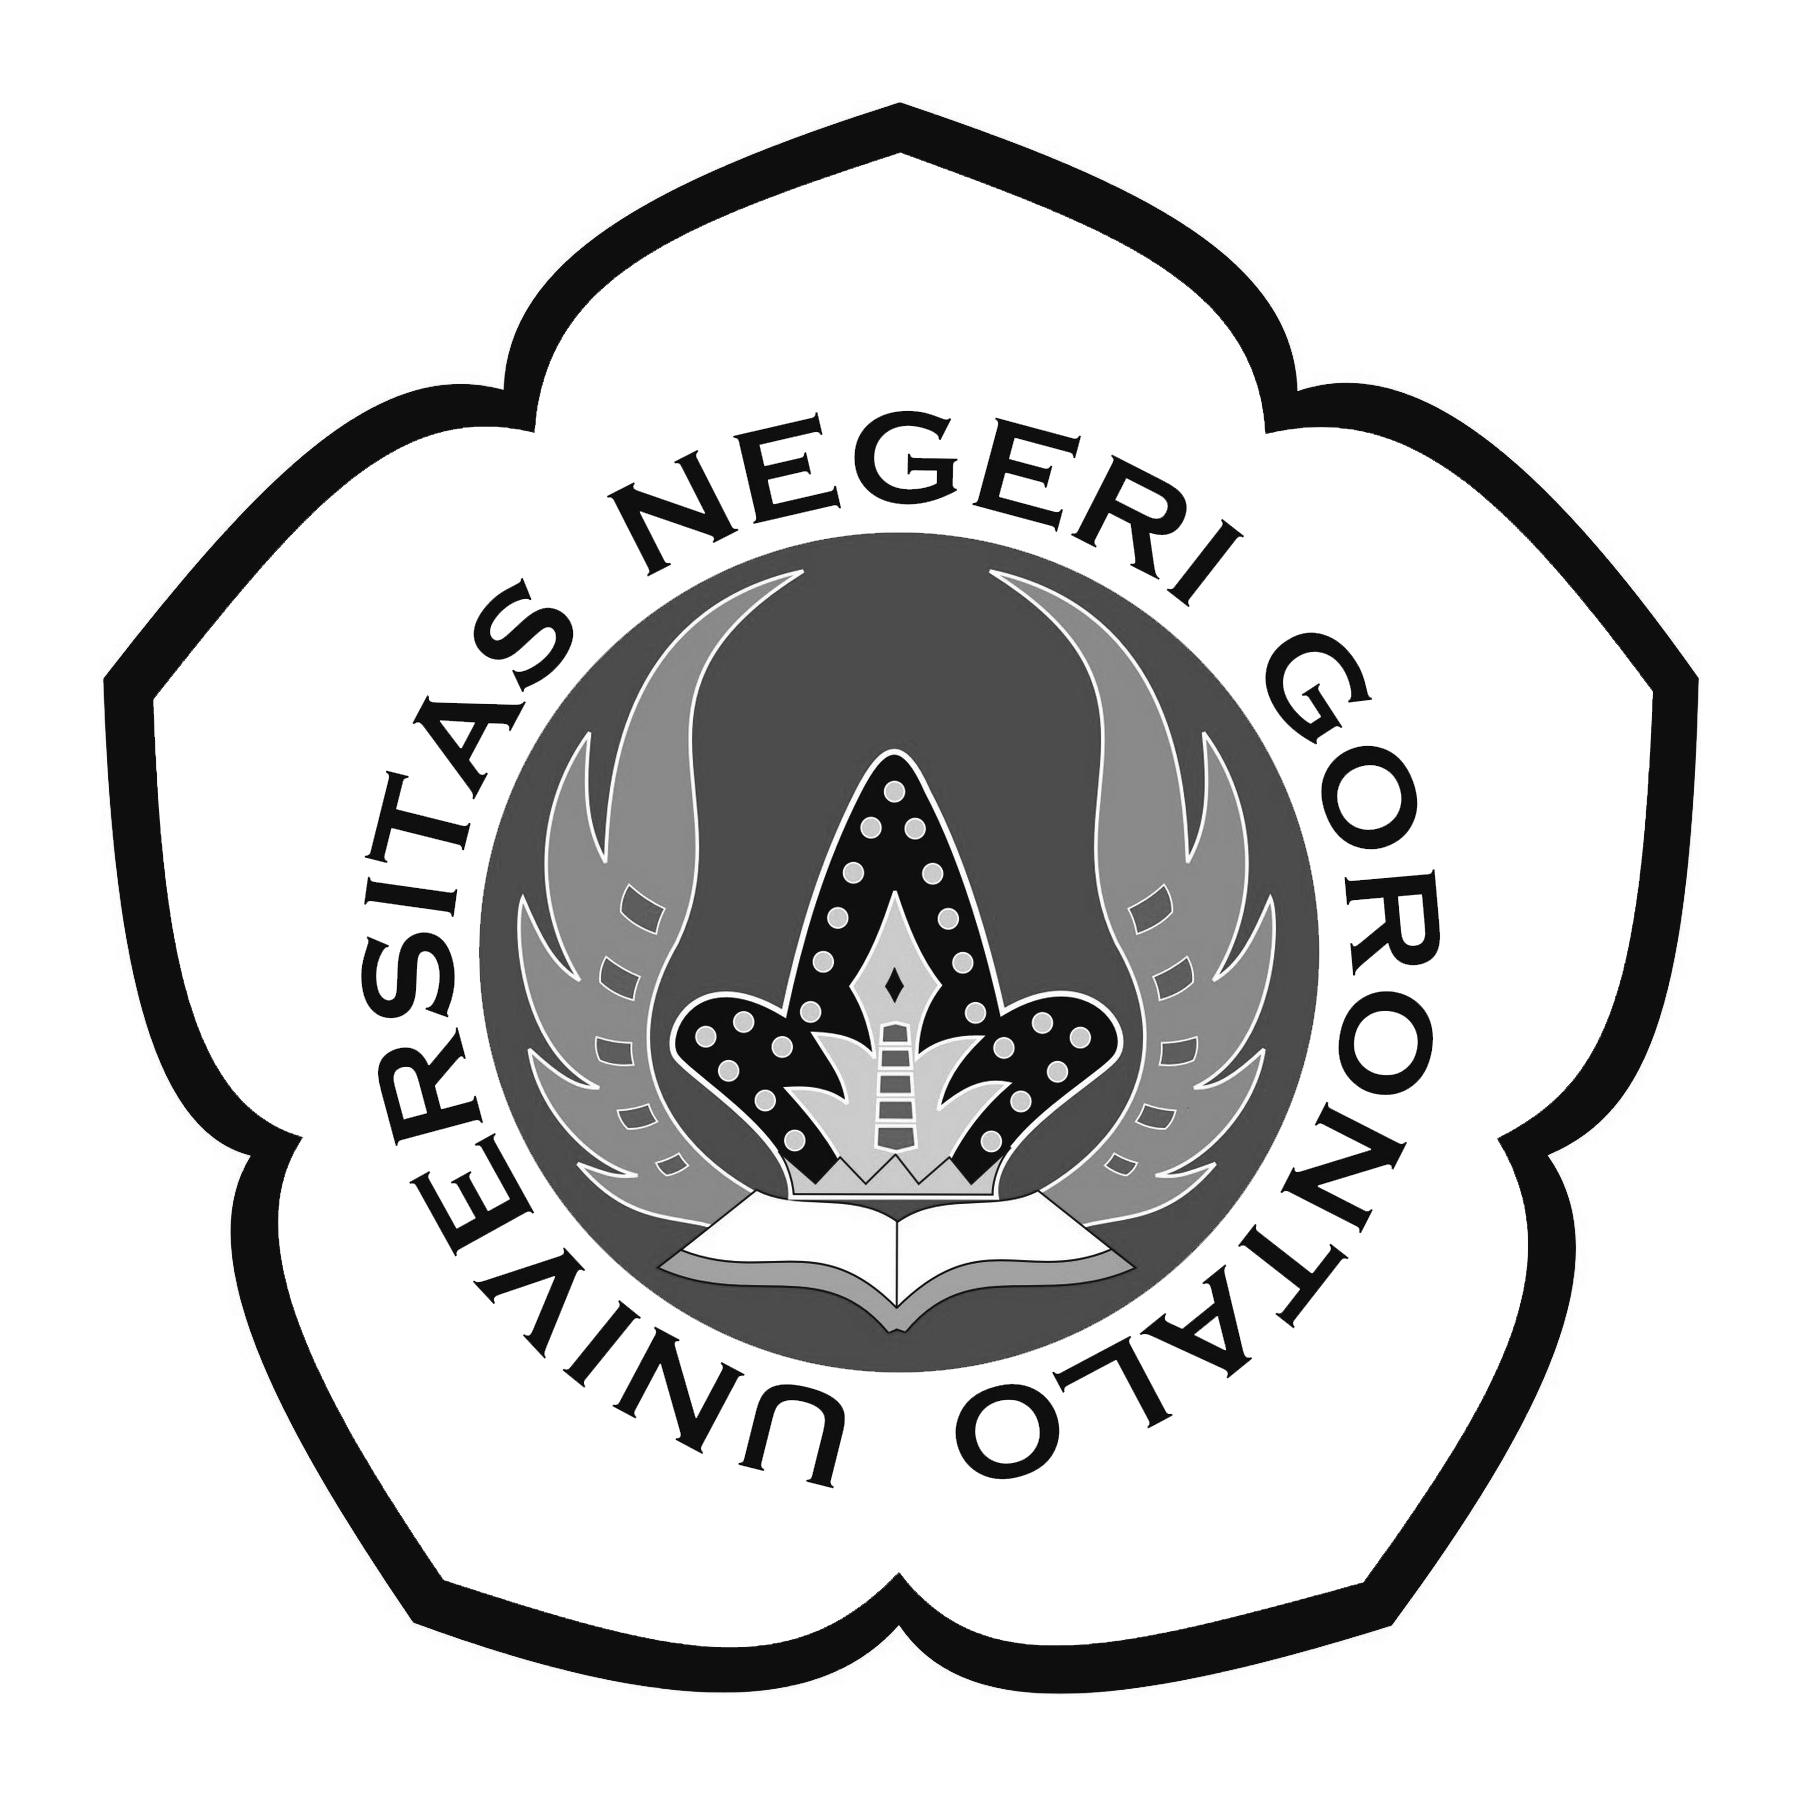 Logo UNG (Universitas Negeri Gorontalo) Grayscale PNG